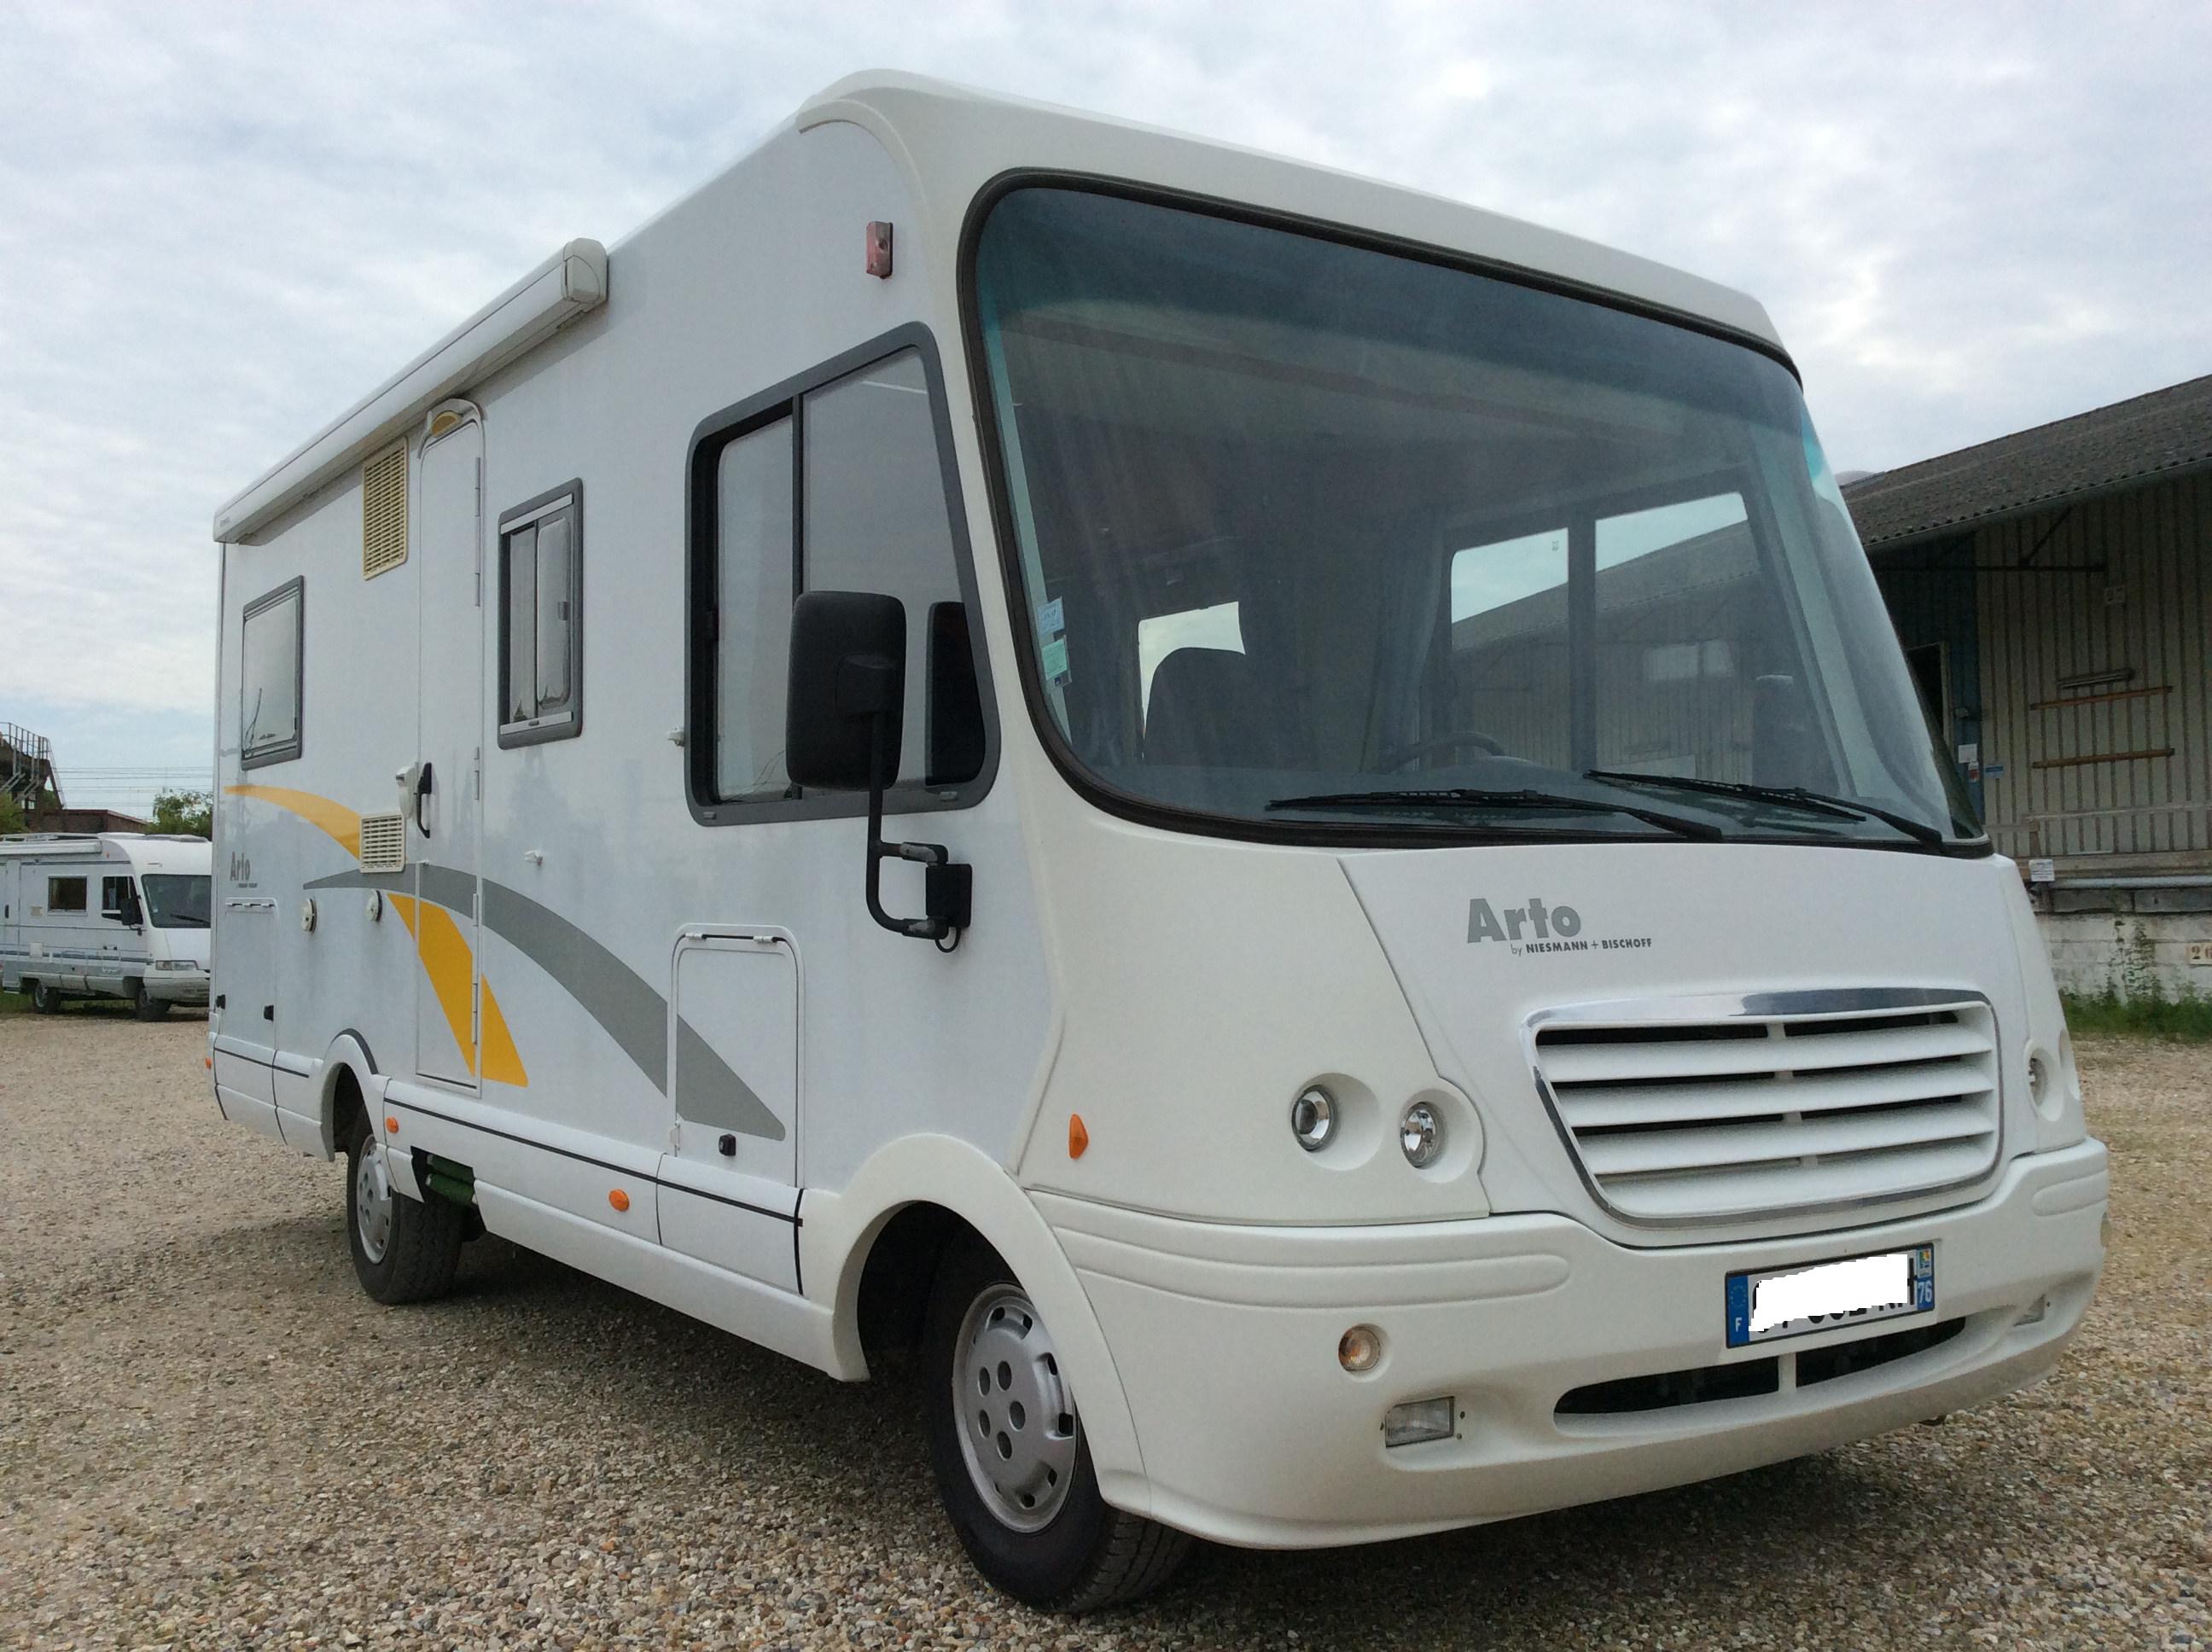 niesmann arto 69 p occasion de 2006 ducato camping car en vente aubevoye eure 27. Black Bedroom Furniture Sets. Home Design Ideas